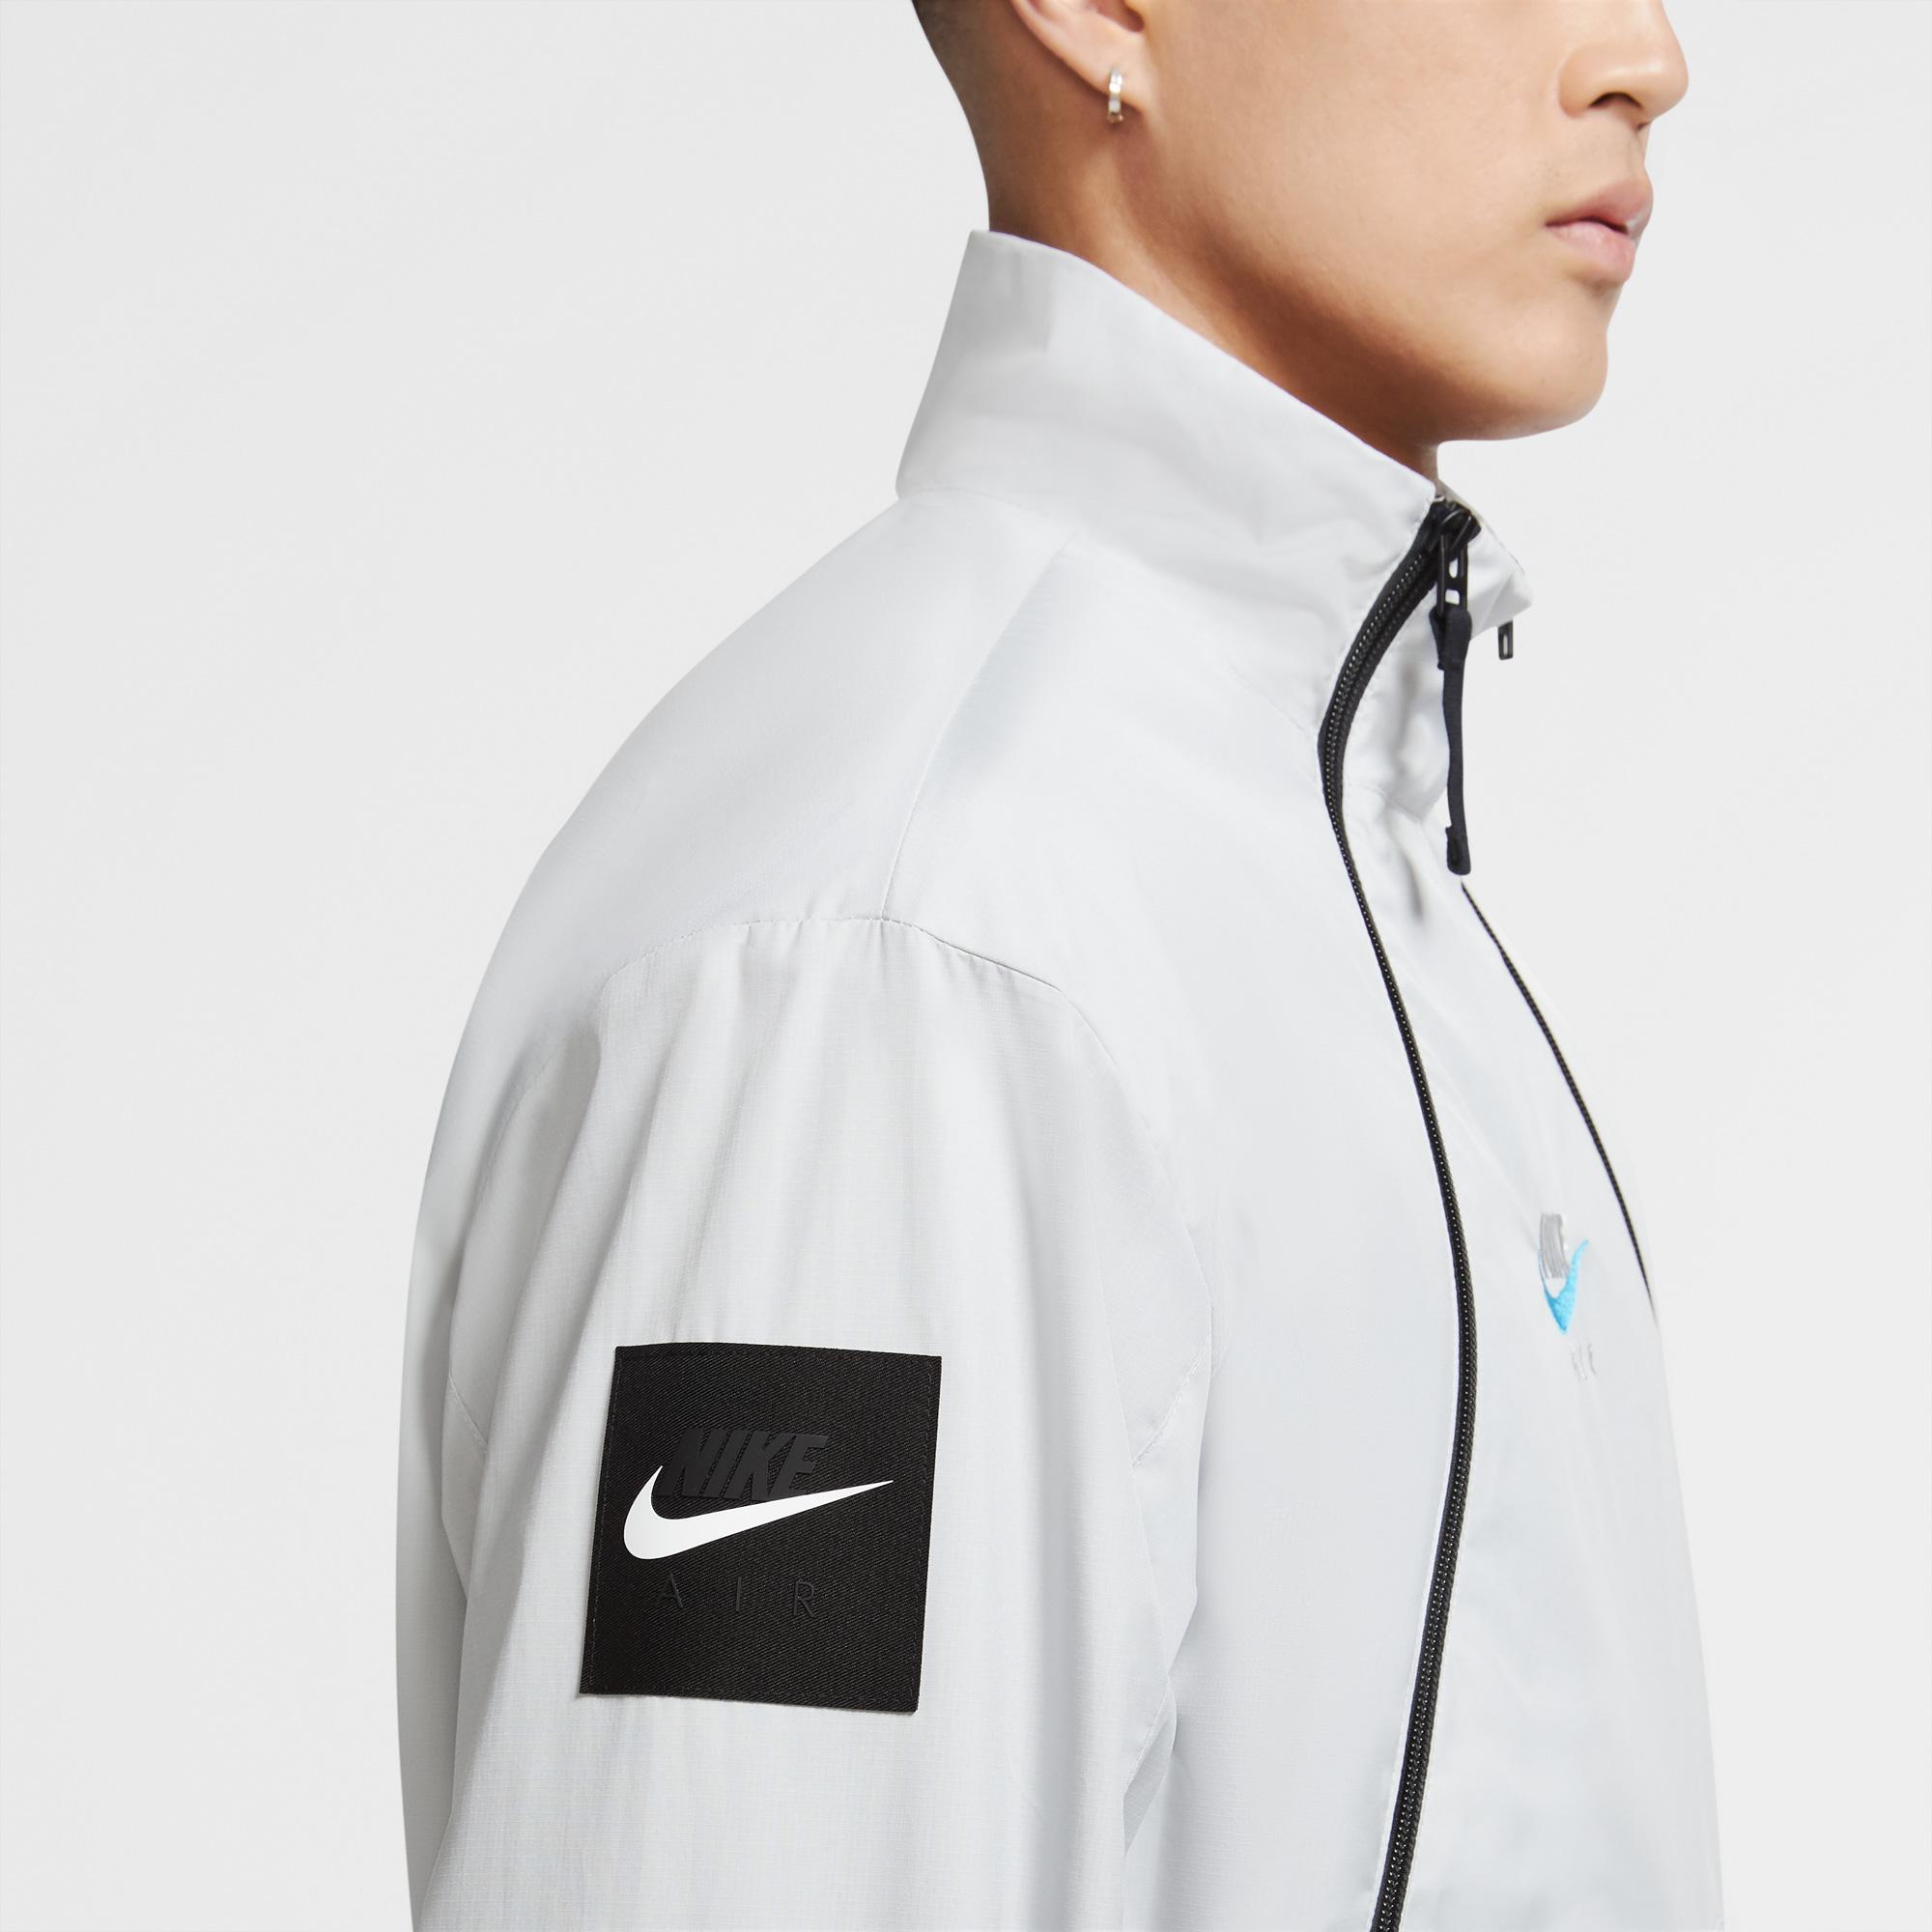 Nike Air Erkek Beyaz Eşofman Üstü